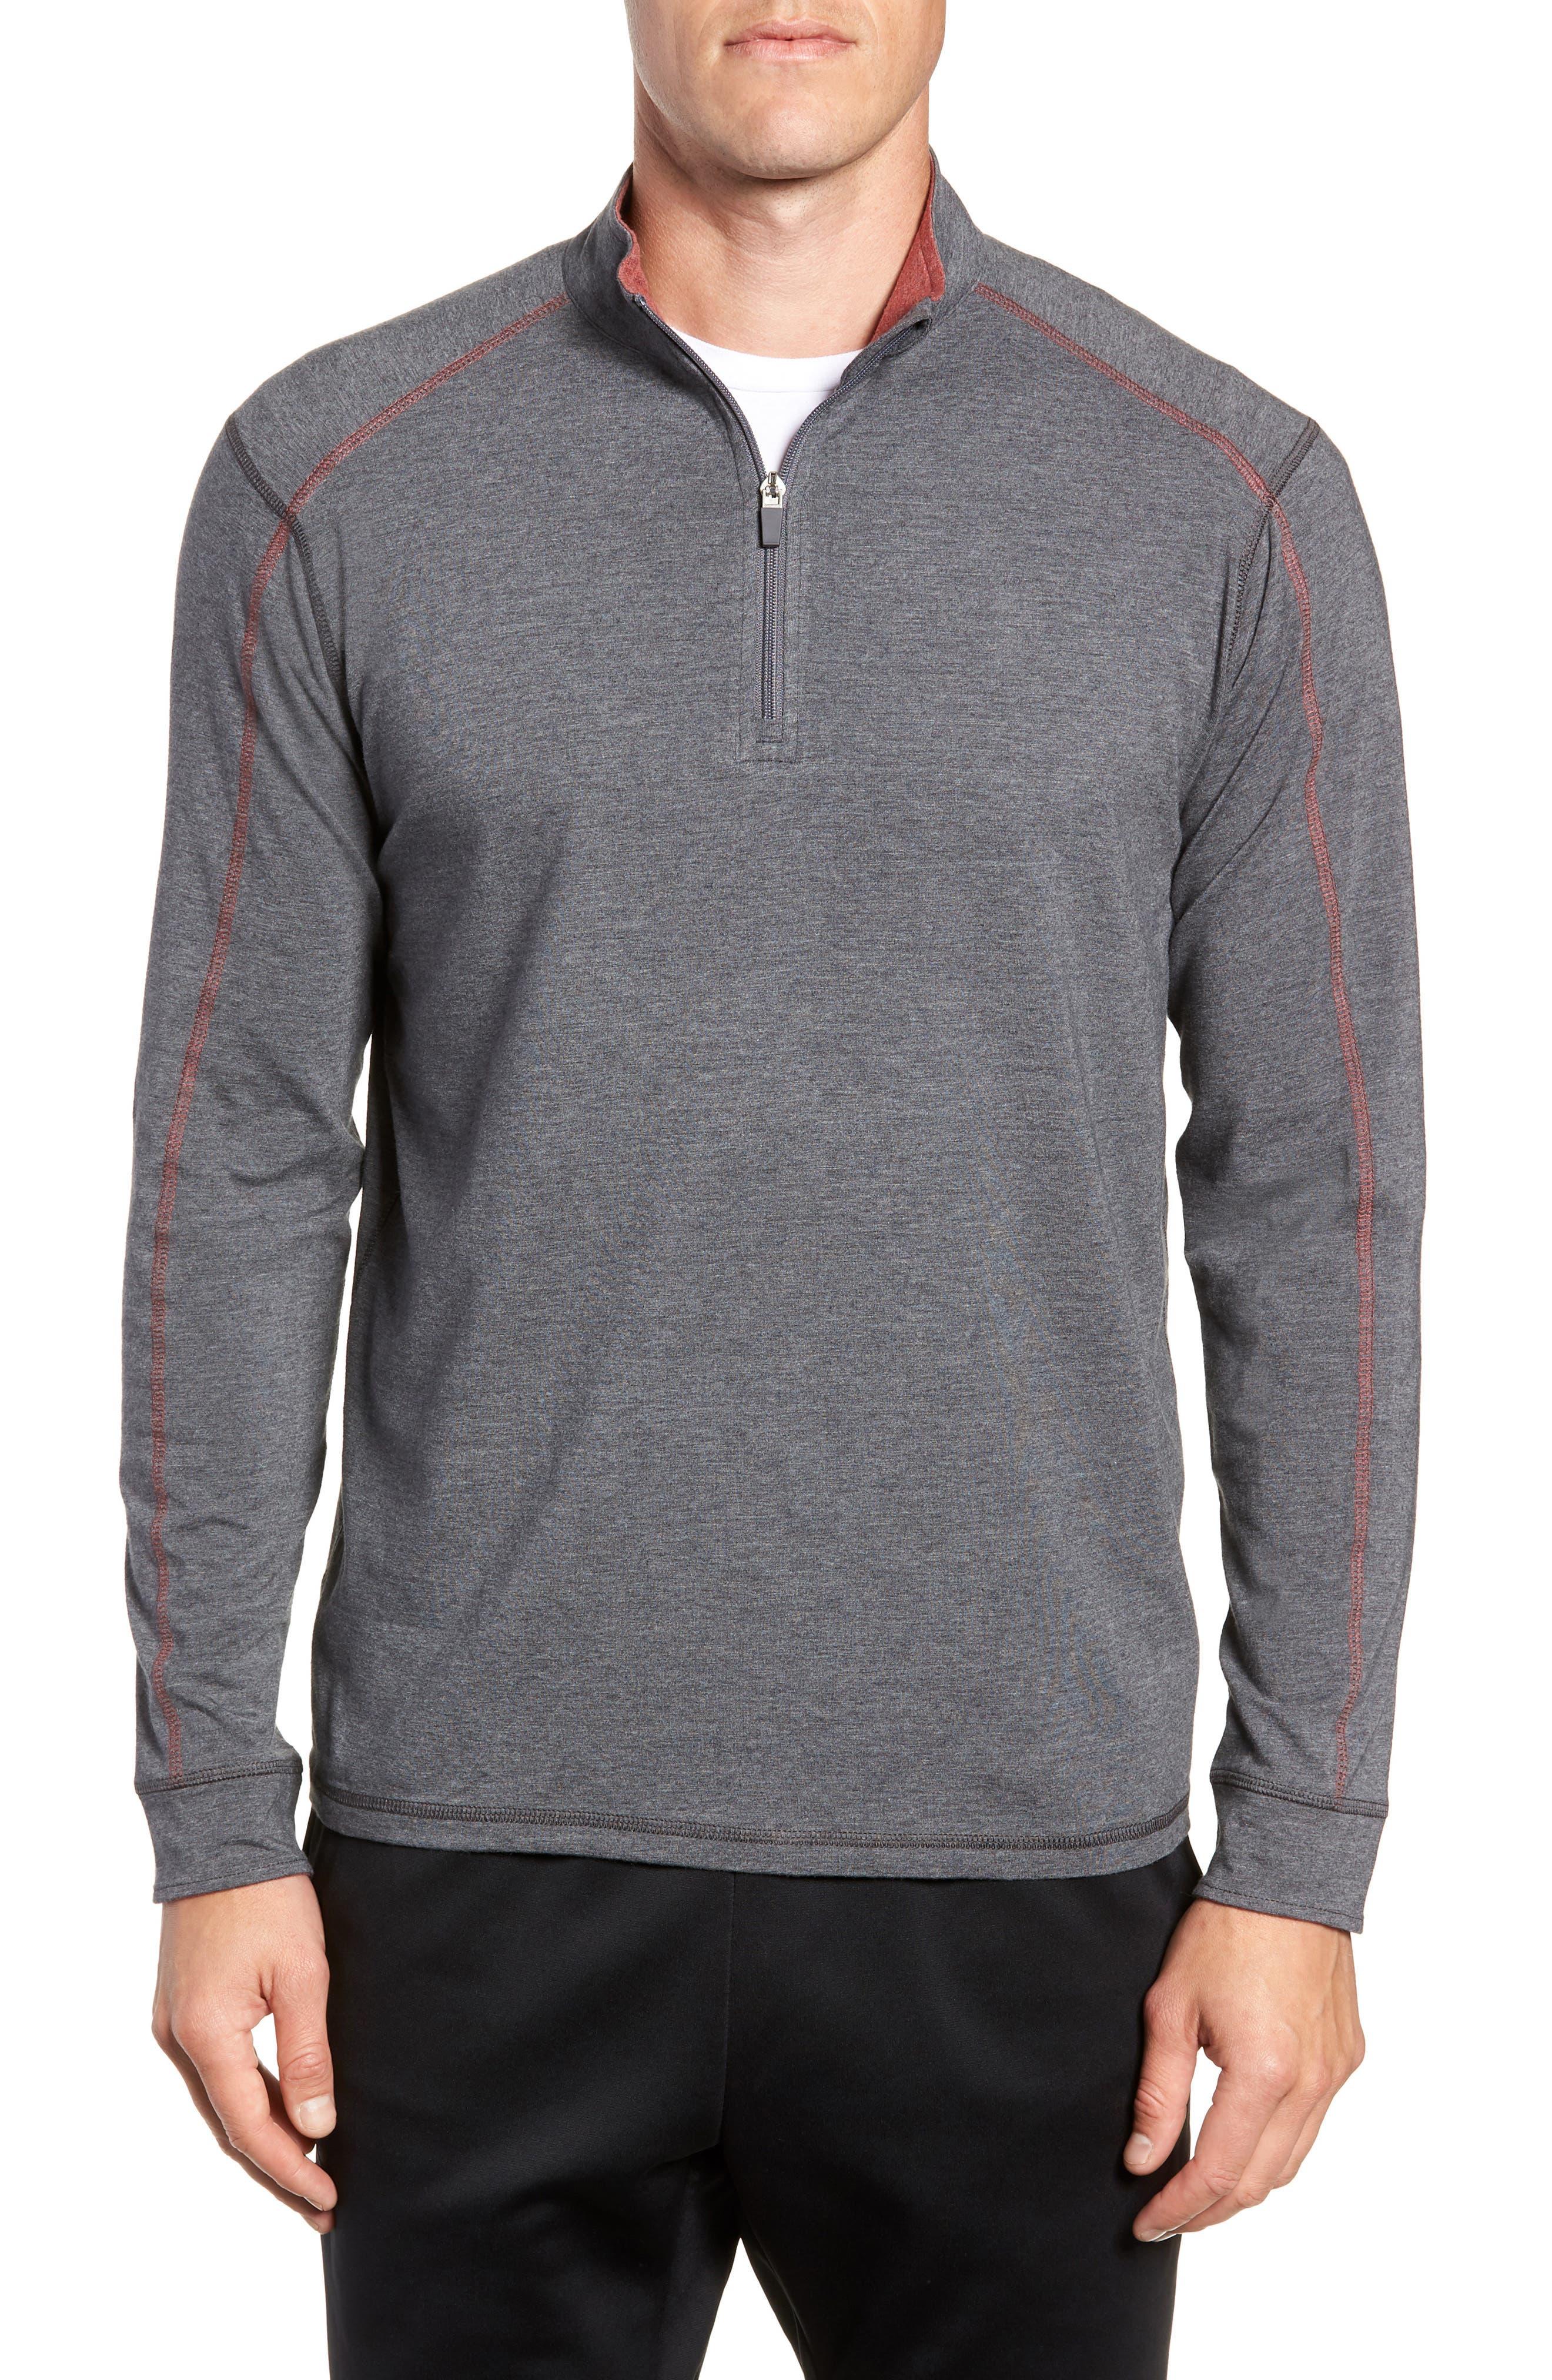 TASC PERFORMANCE Carrollton Quarter Zip Sweatshirt, Main, color, BLACK HEATHER/ MERCURY